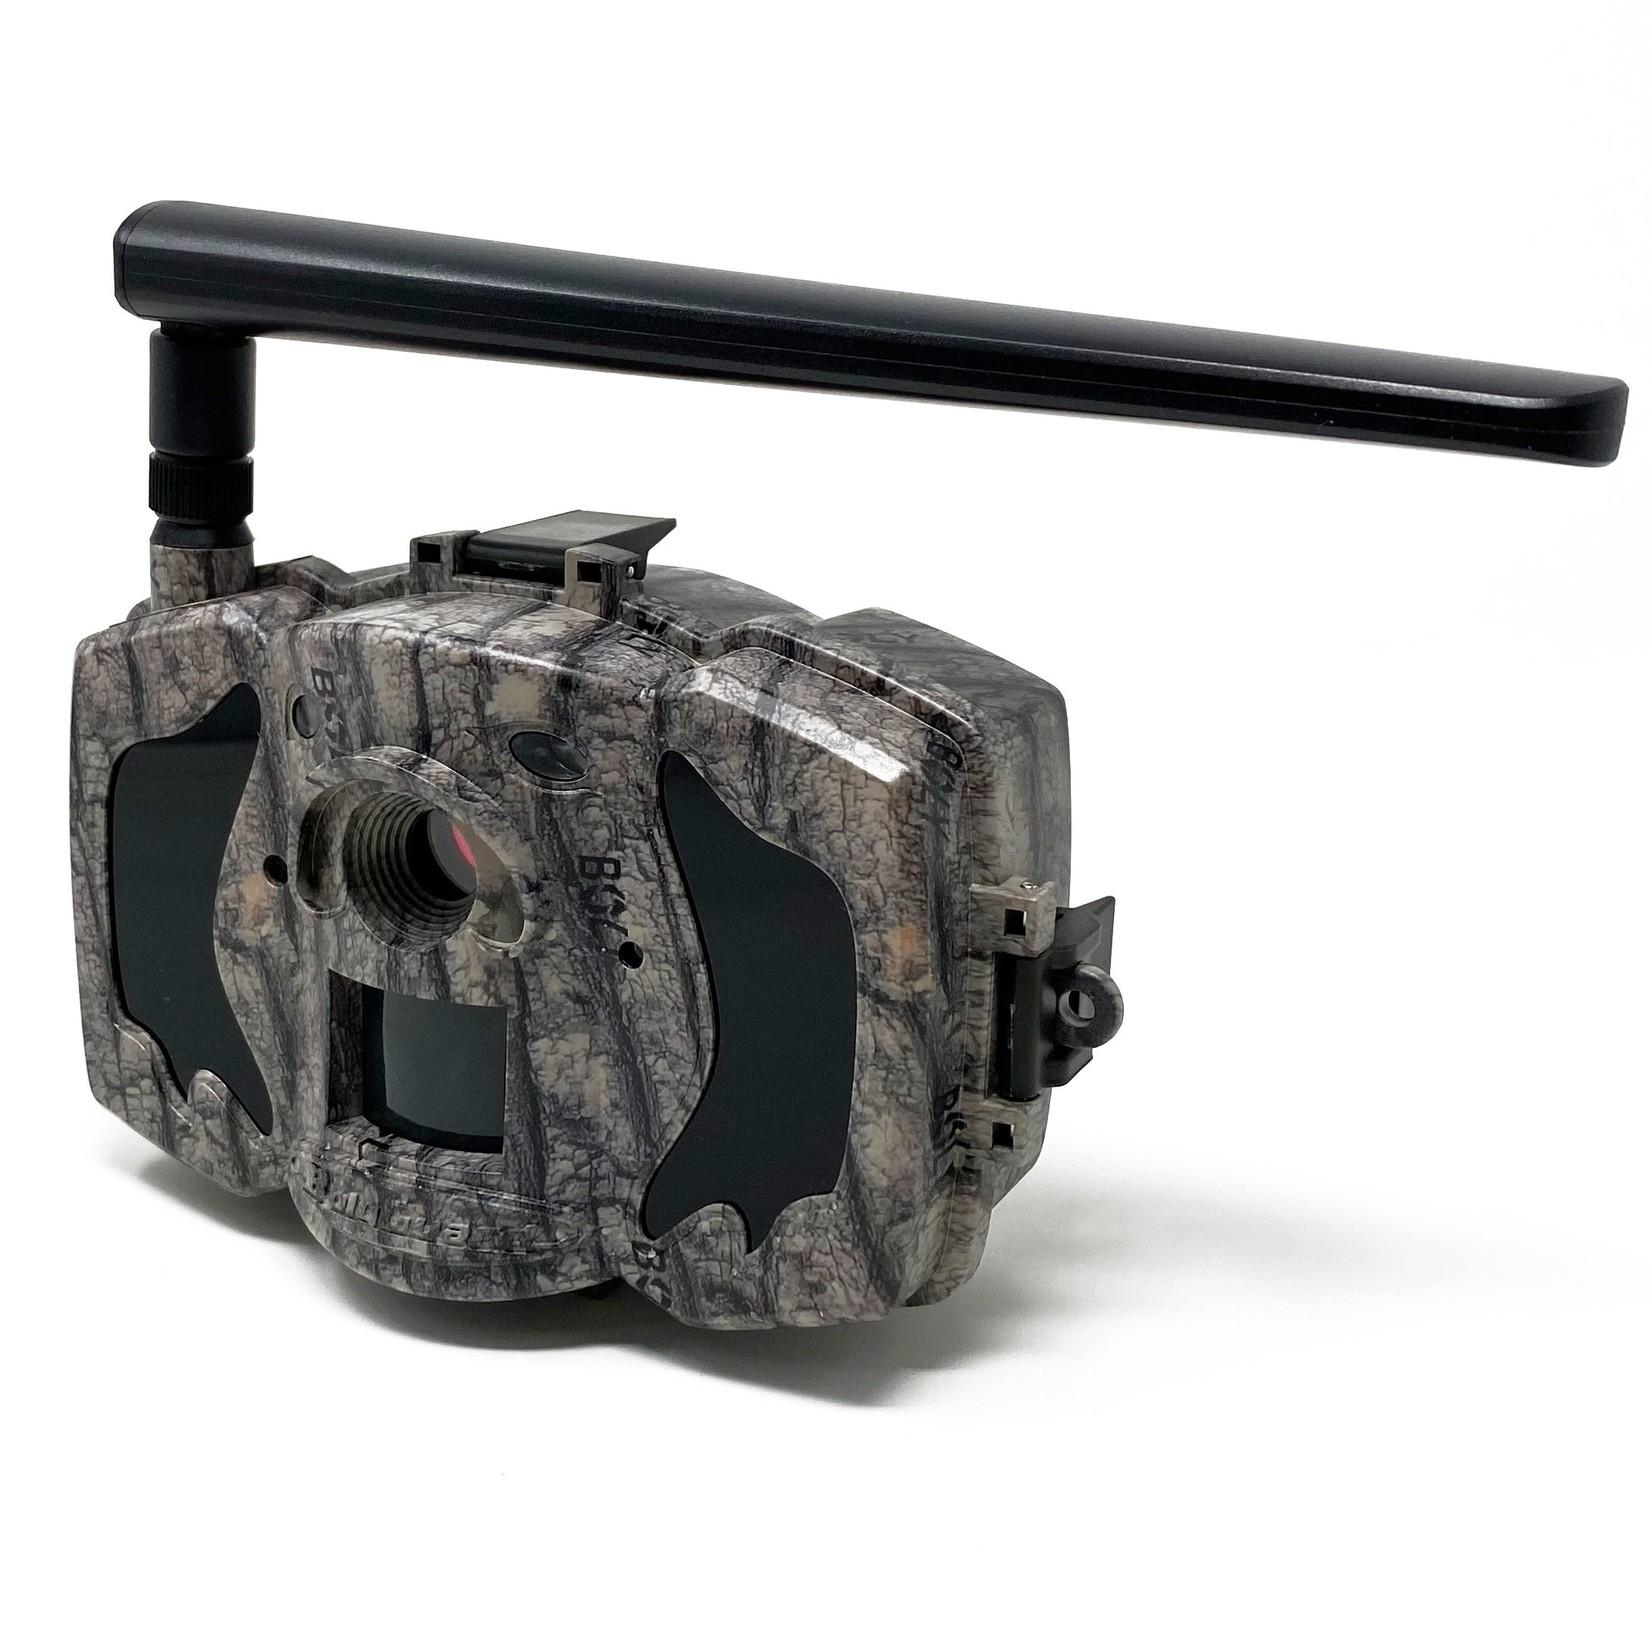 Boly Cellular Digital Scouting Camera - MG984G-36M